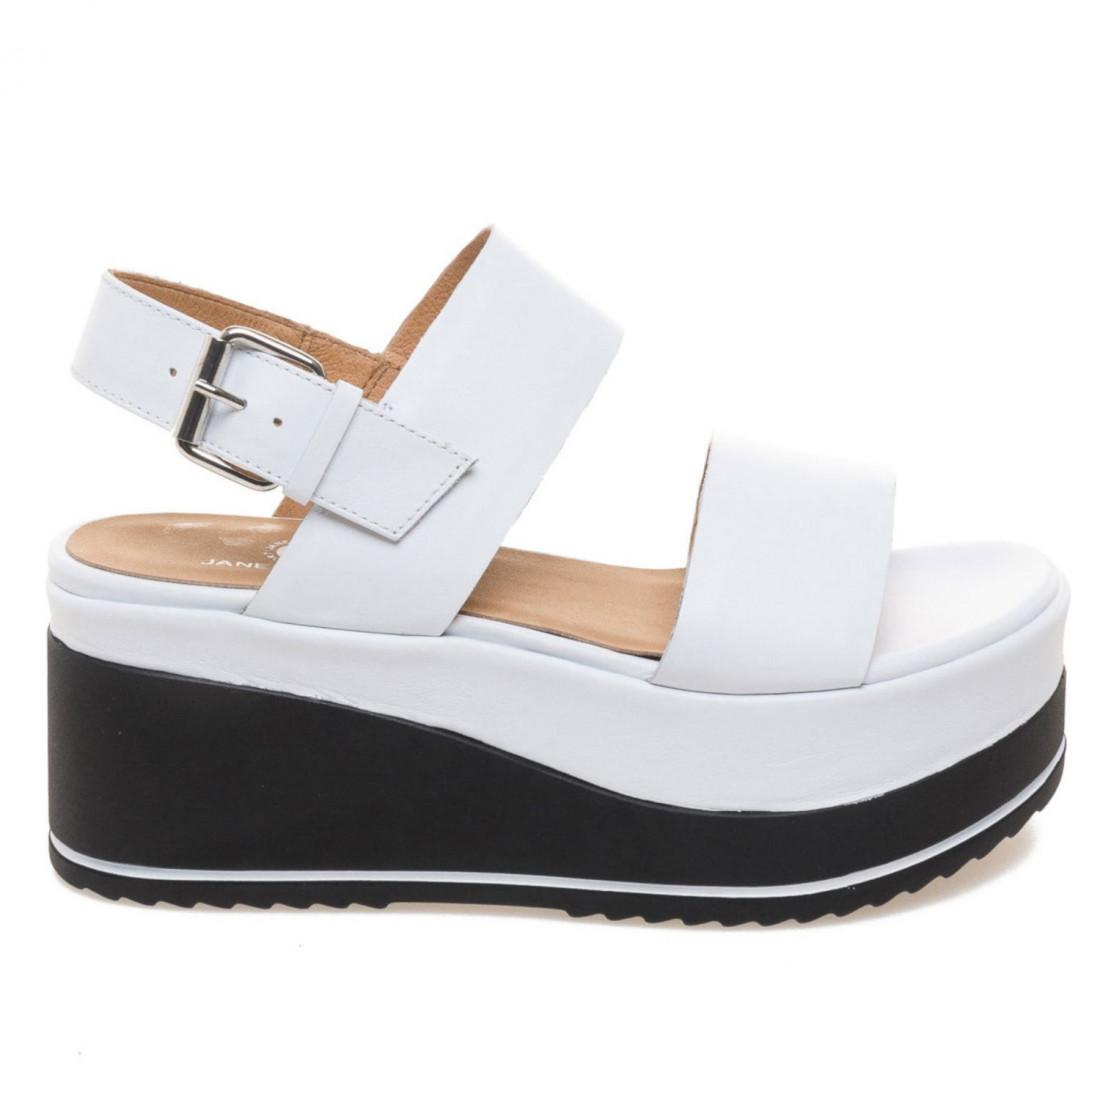 nuovo di zecca 65b3b 5511a White leather Janet Sport Natasha wedge sandals